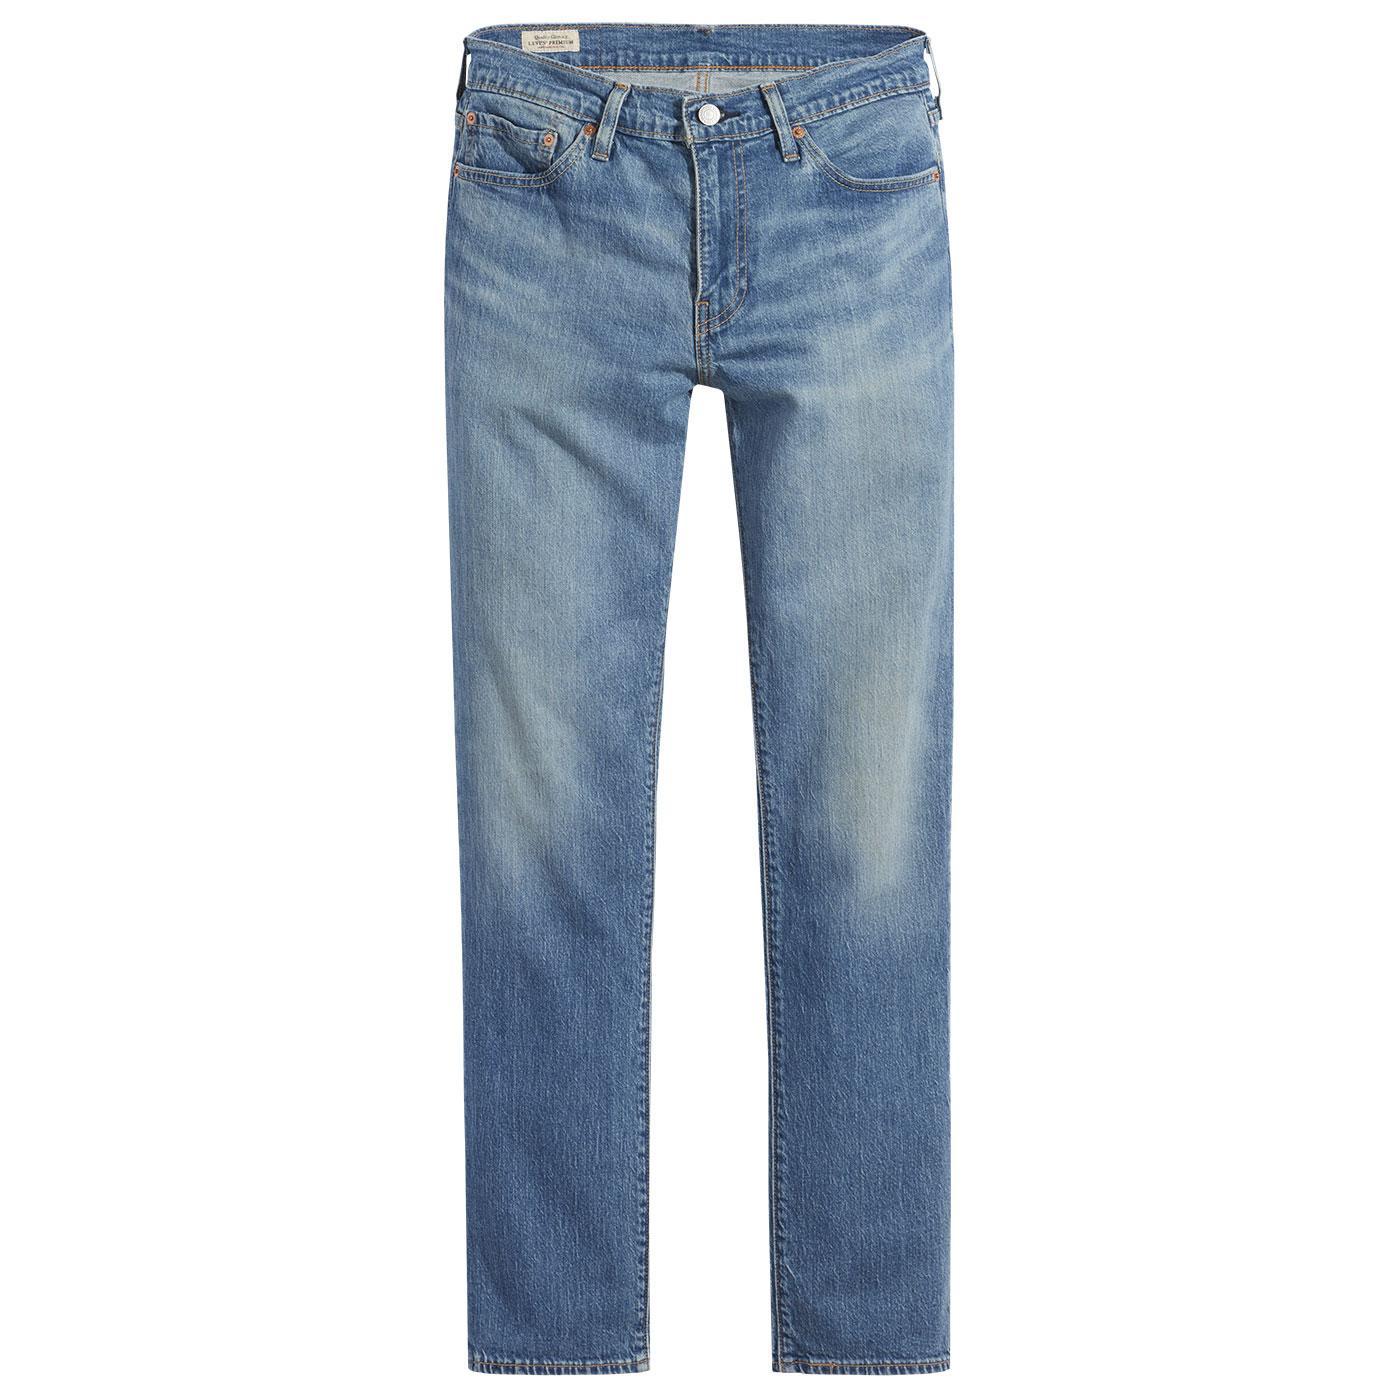 LEVI'S 511 Slim Retro Jeans (Sellwood Dance)